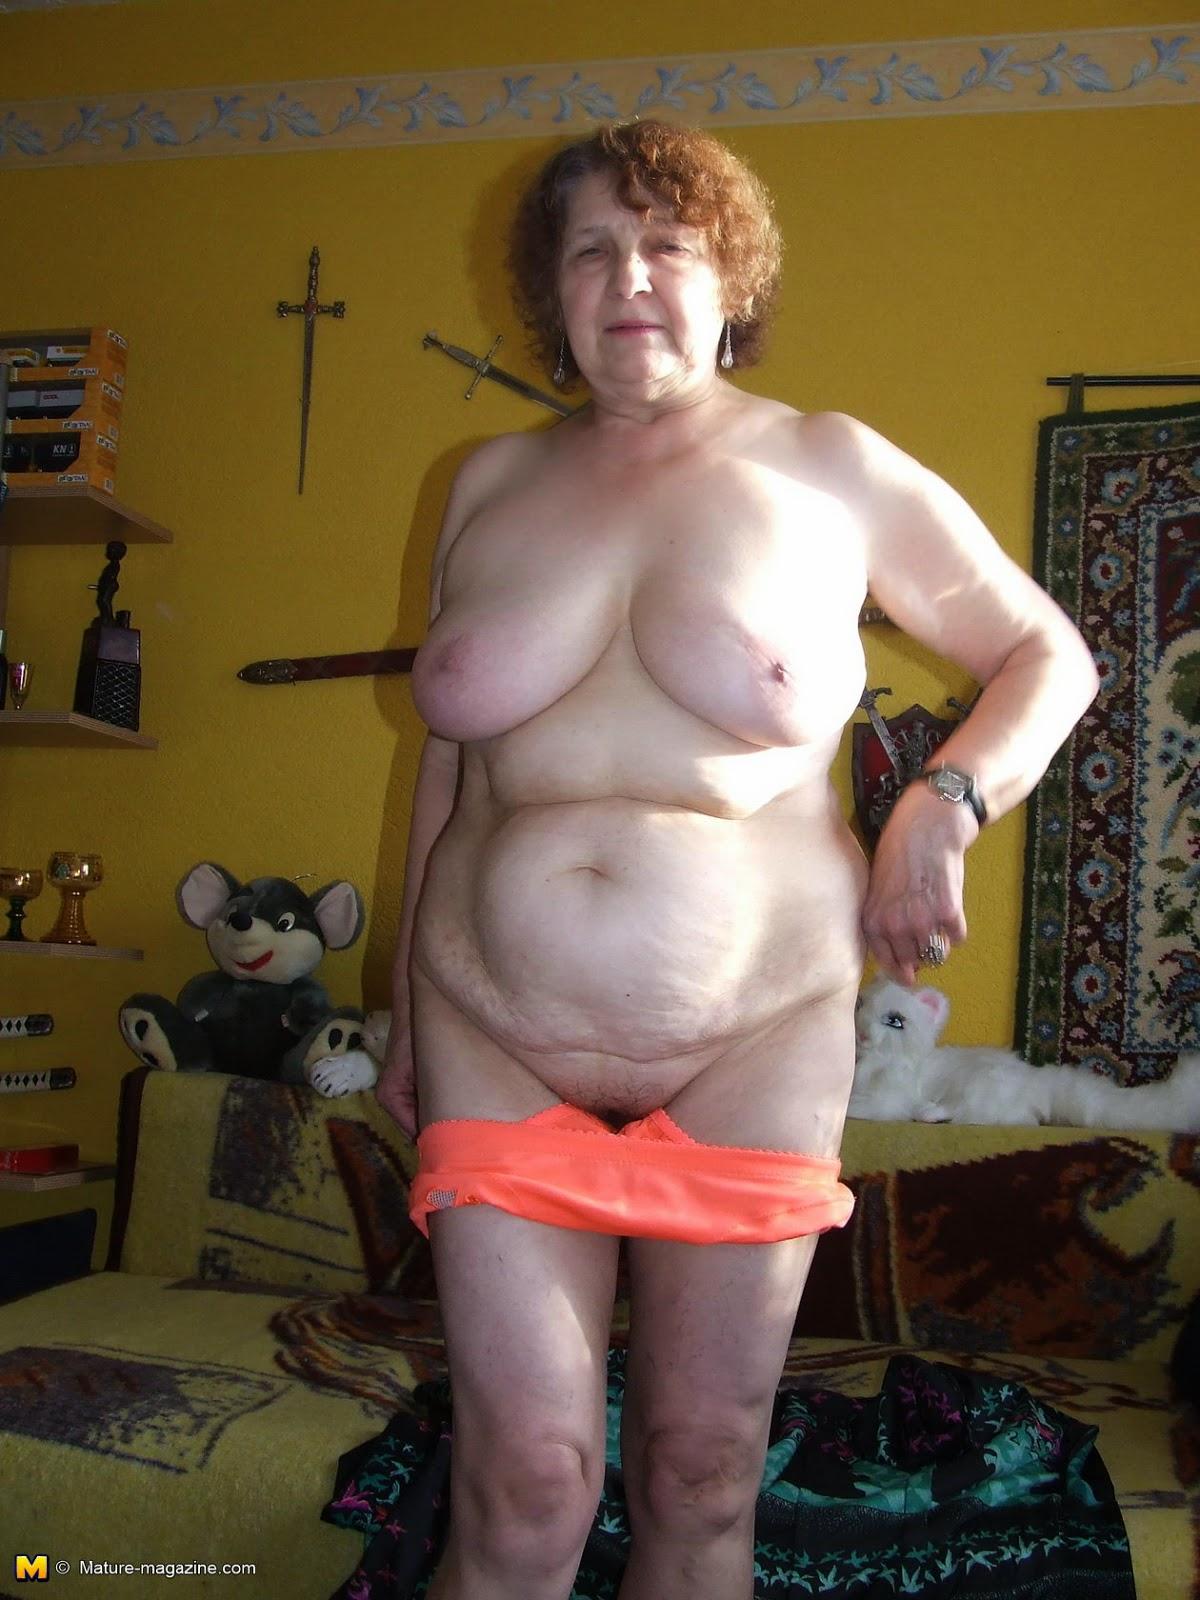 Mature slut alesia pleasure uses her dildos on her wet twat 8